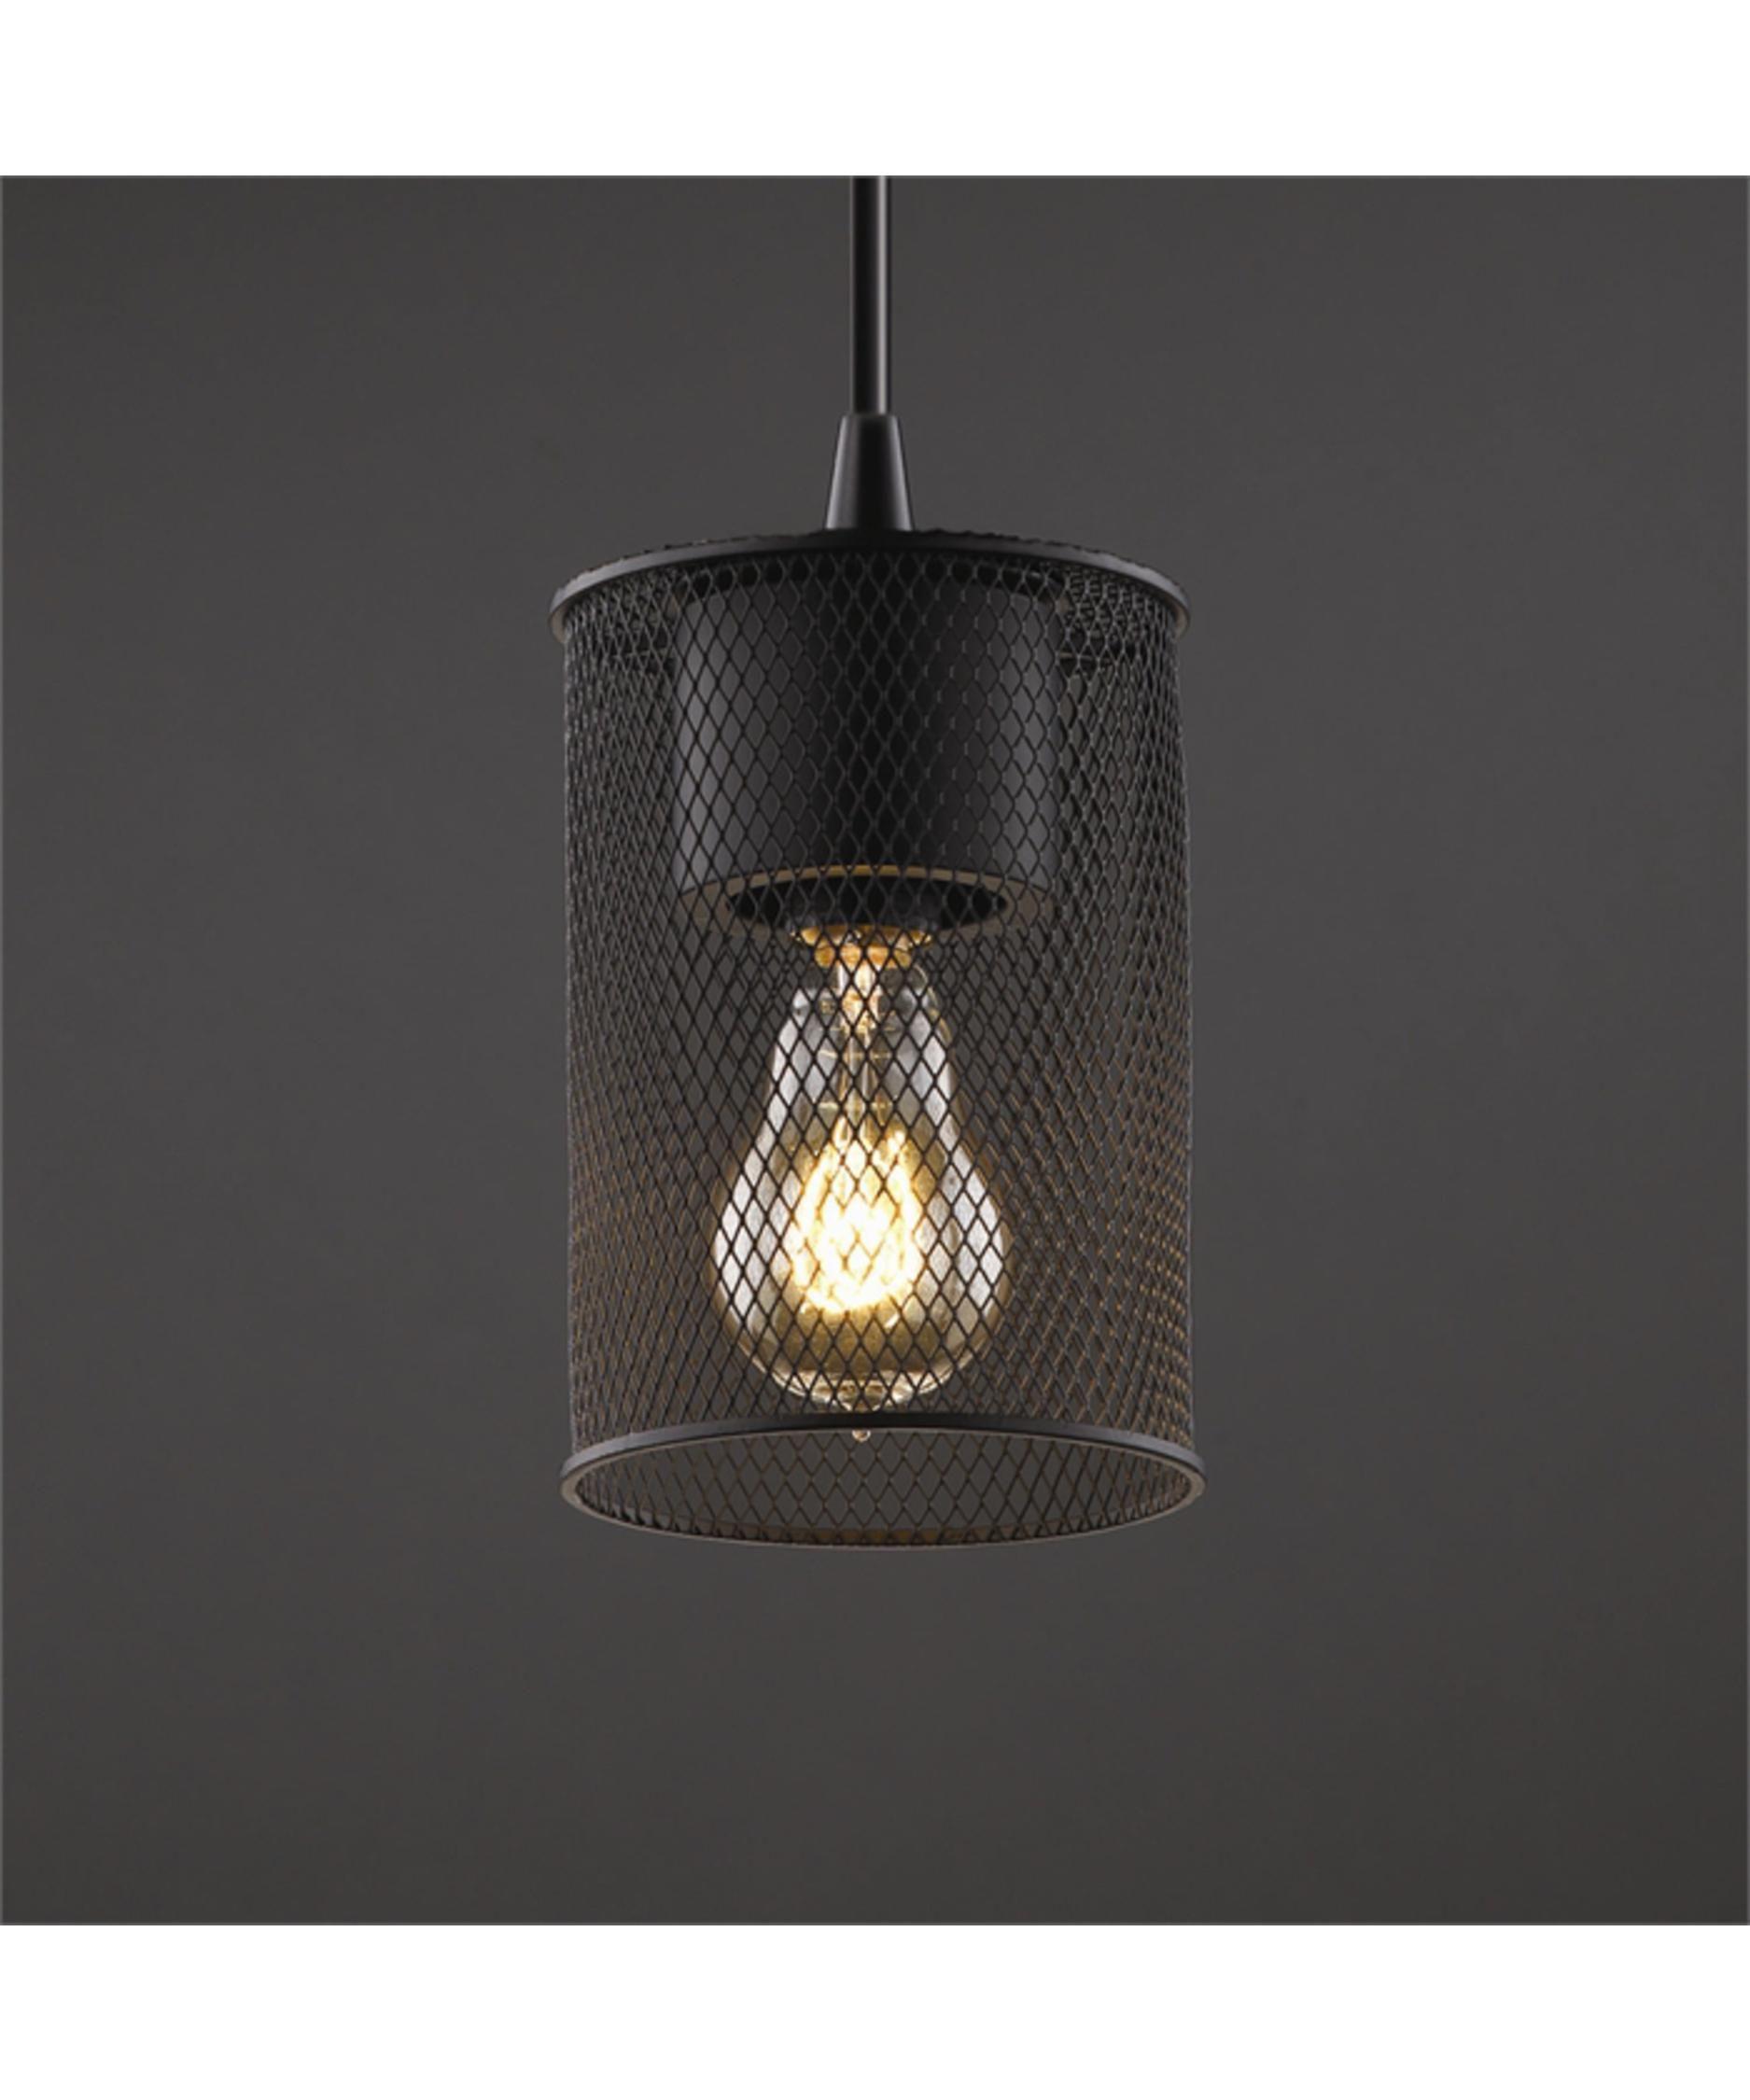 Justice Design Group Wire Mesh 9 Inch Wide 1 Light Mini Pendant ...